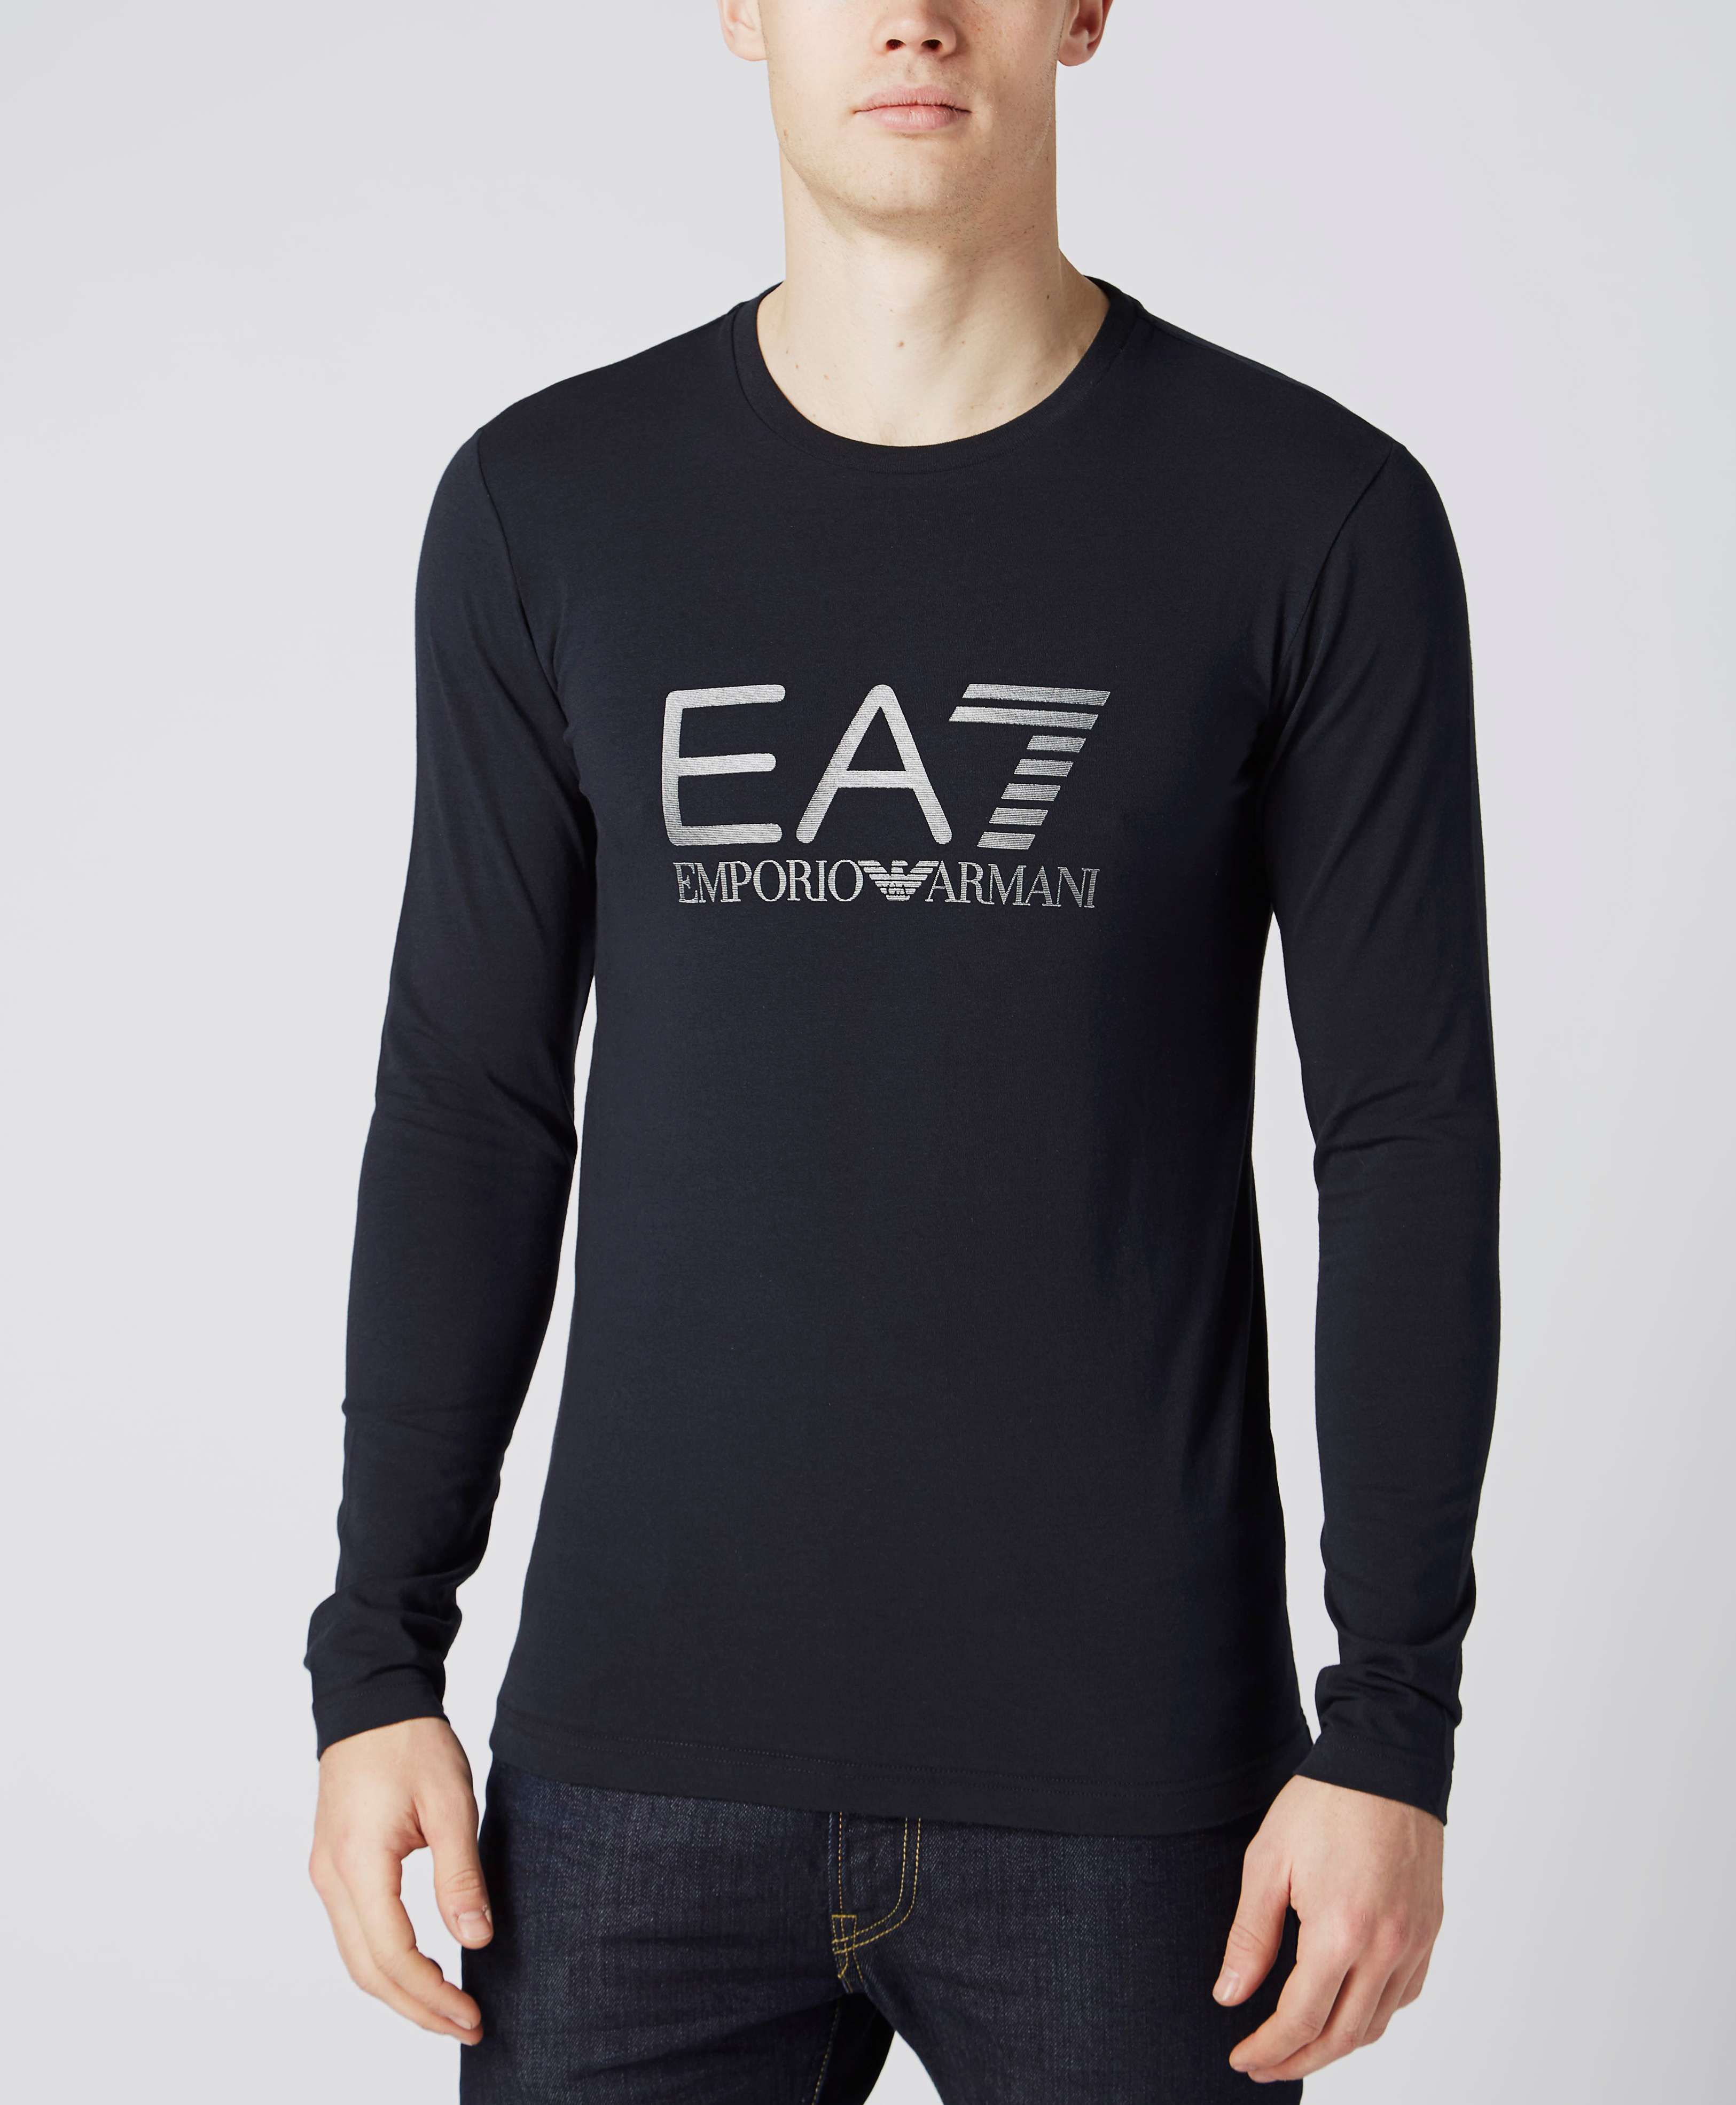 b447f9d2 Emporio Armani EA7 Long Sleeve Logo T-Shirt | scotts Menswear